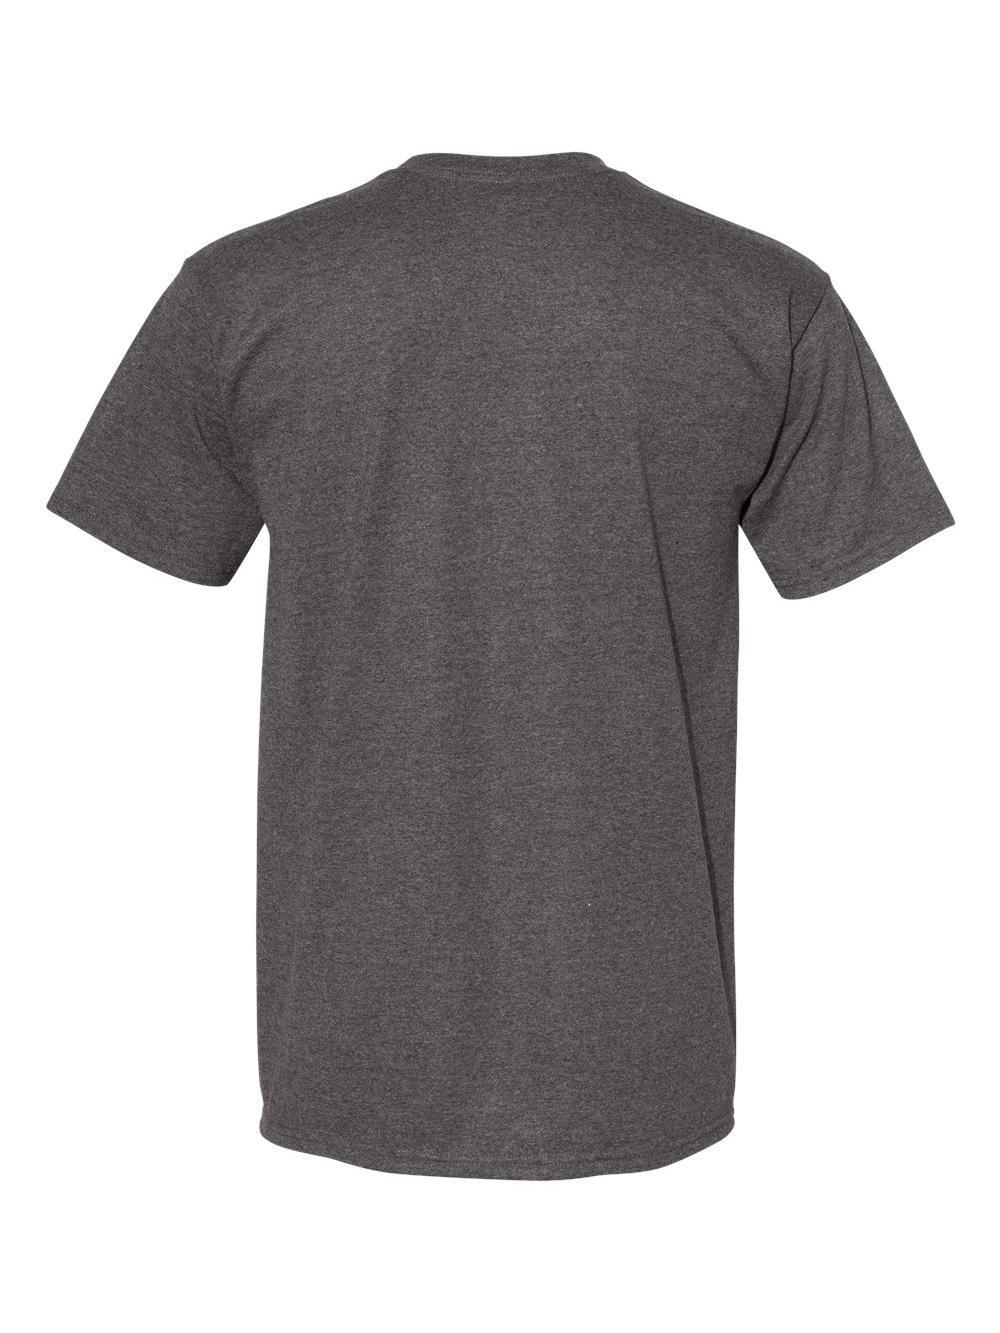 ALSTYLE-Premium-T-Shirt-1701 thumbnail 28